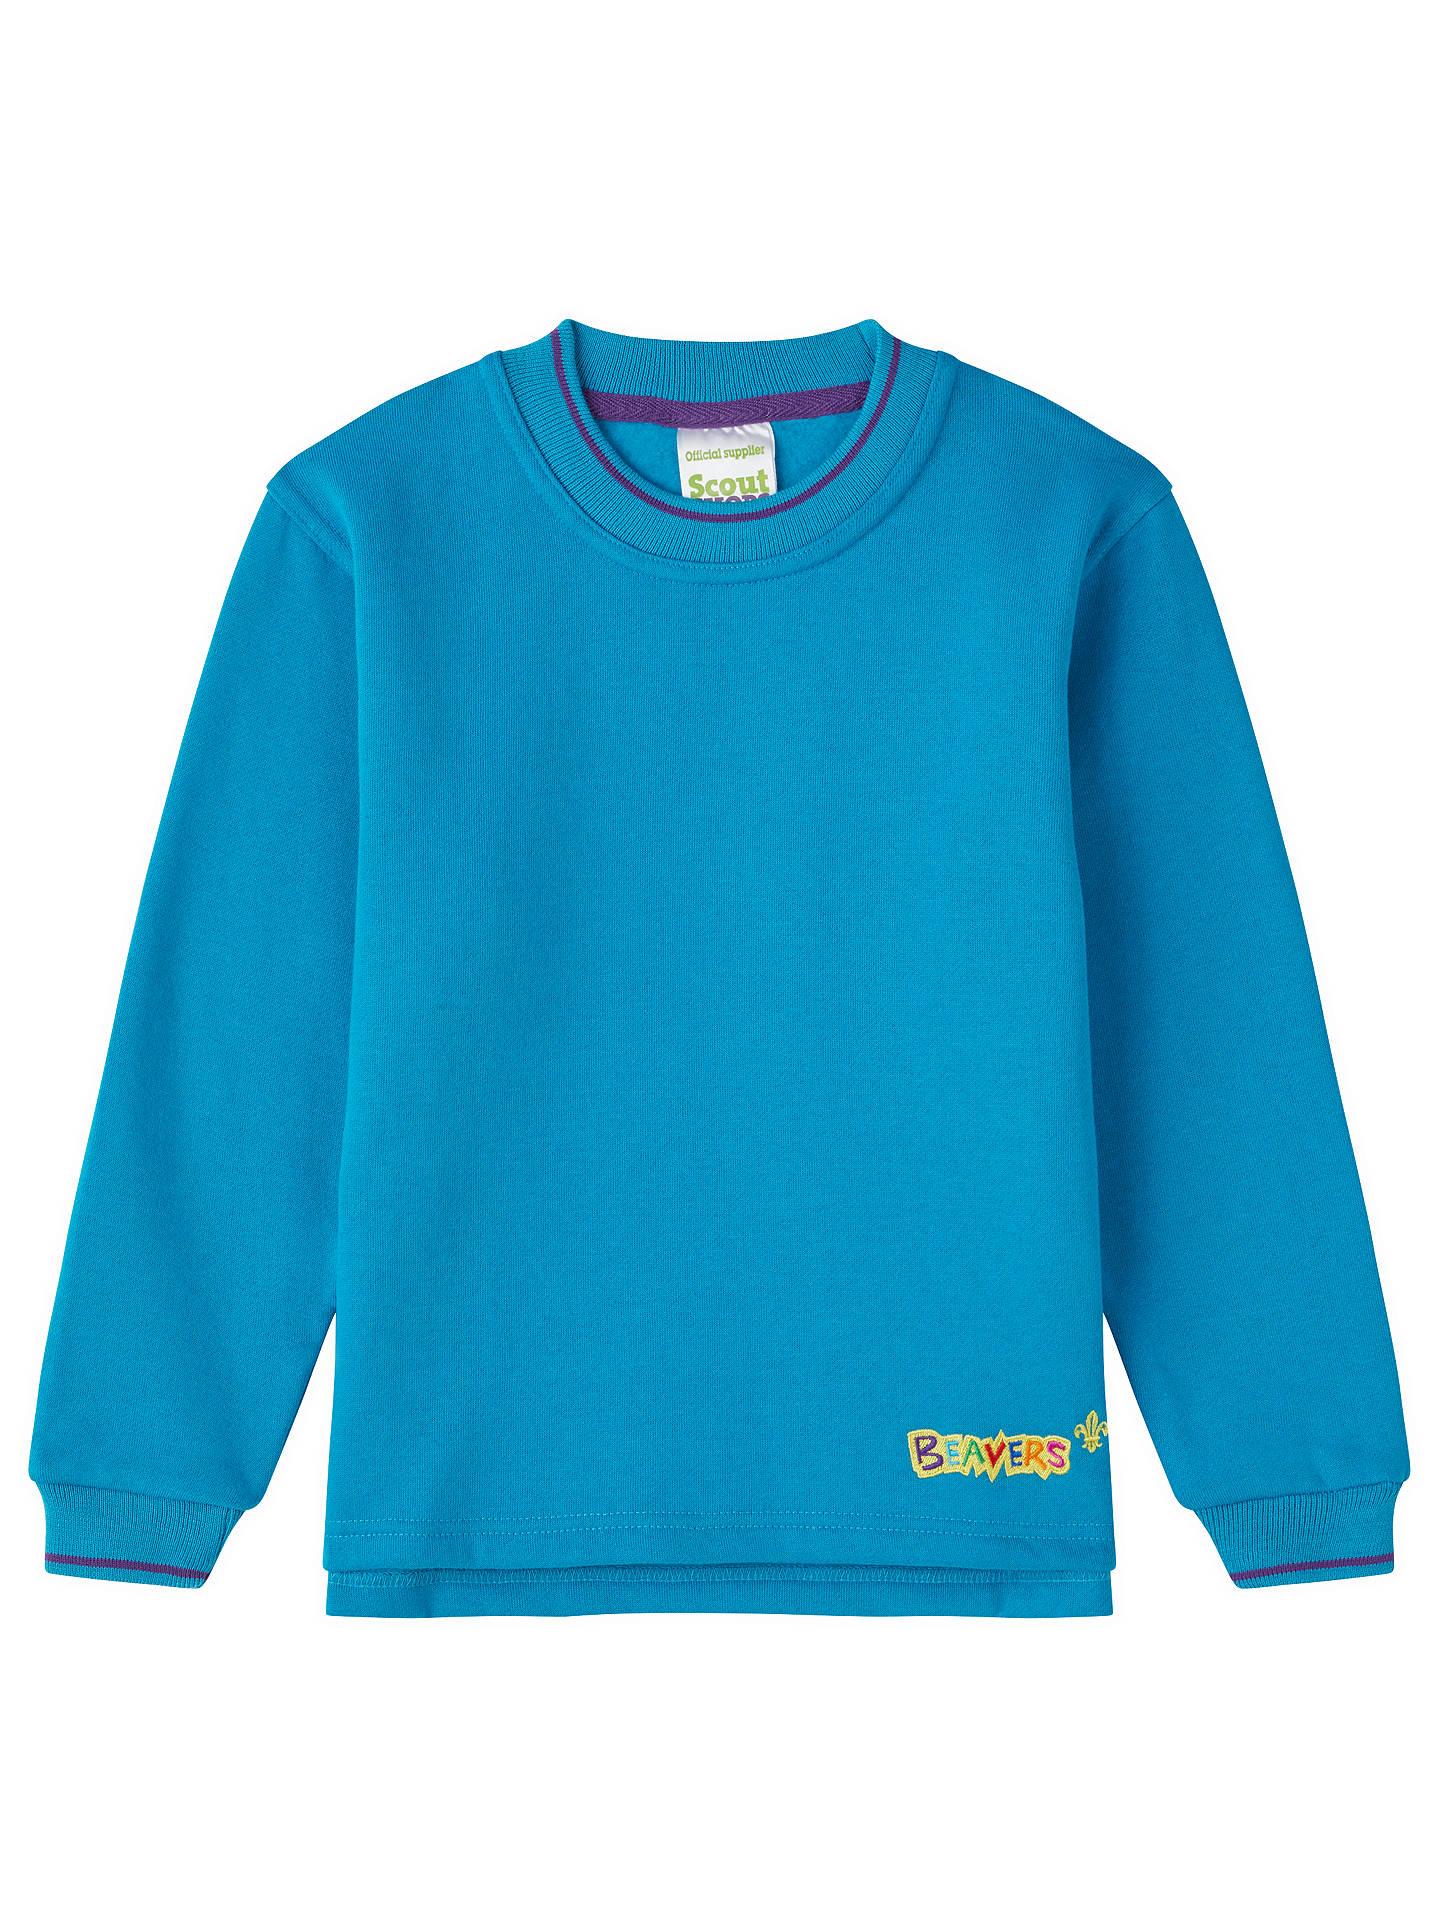 47b0f9c0 Buy Beavers Uniform Sweatshirt, Blue, Chest 28 Online at johnlewis.com